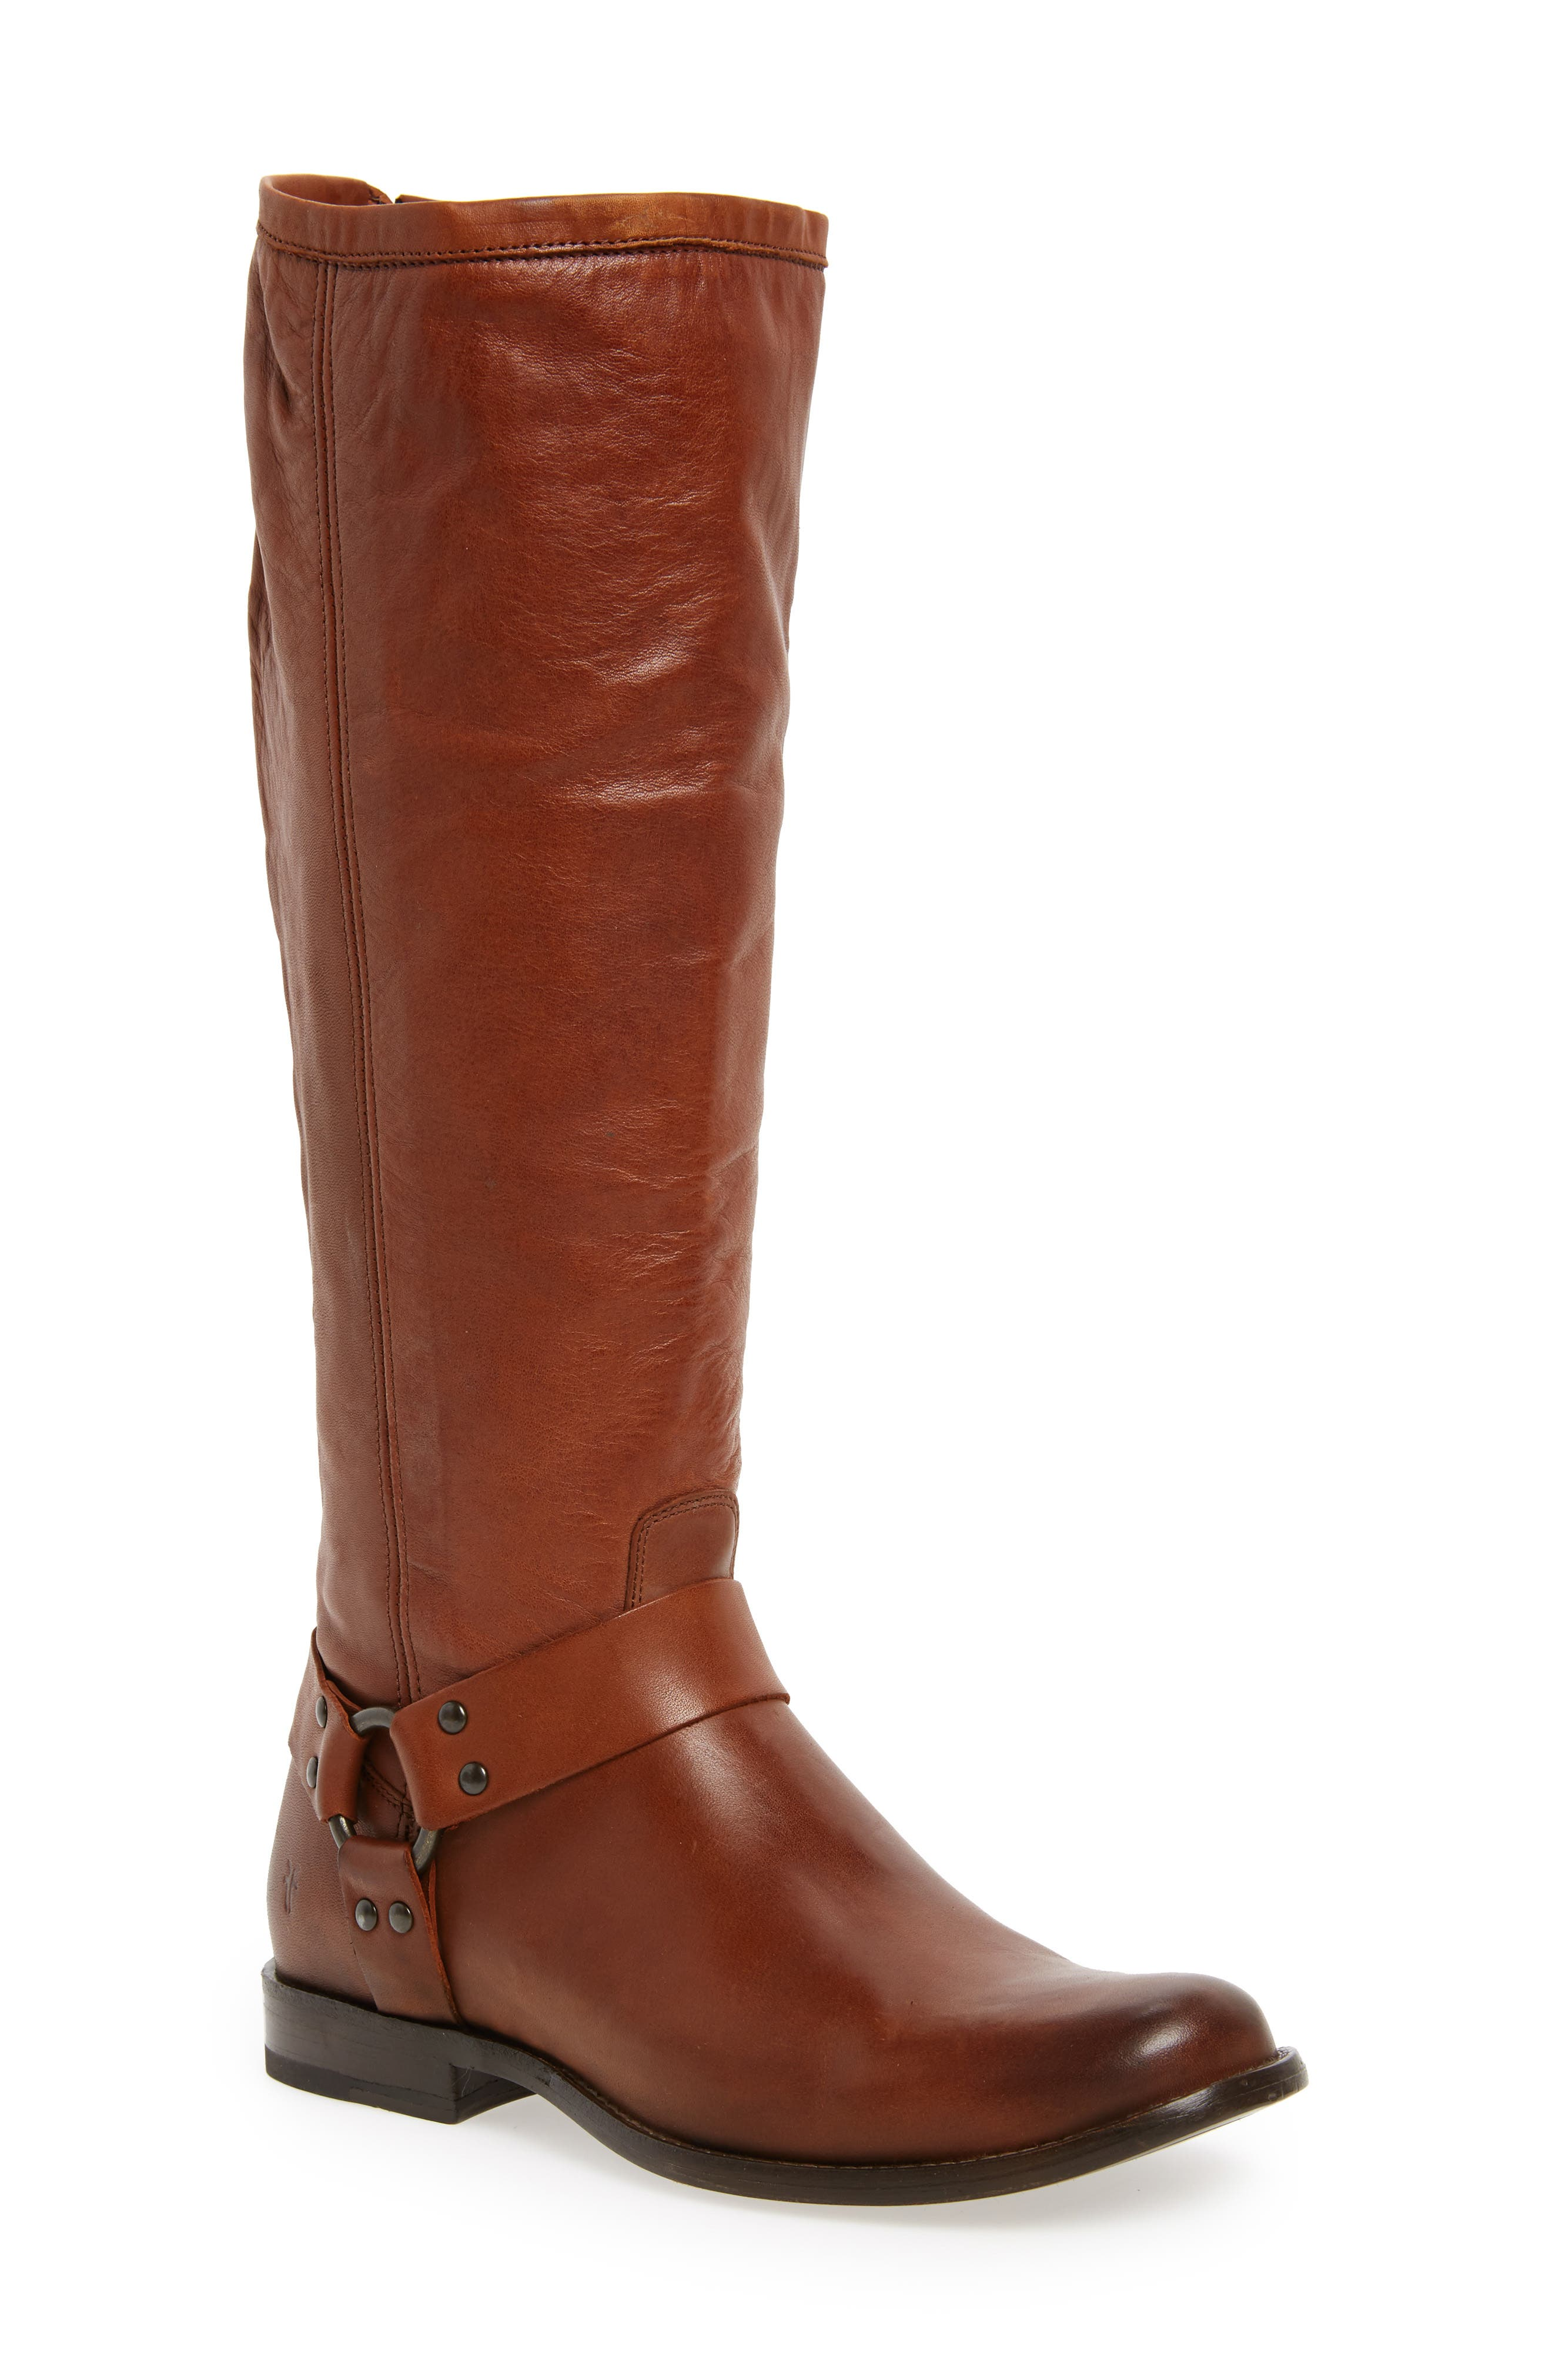 Alternate Image 1 Selected - Frye Phillip Harness Tall Boot (Women) (Regular & Extended Calf)